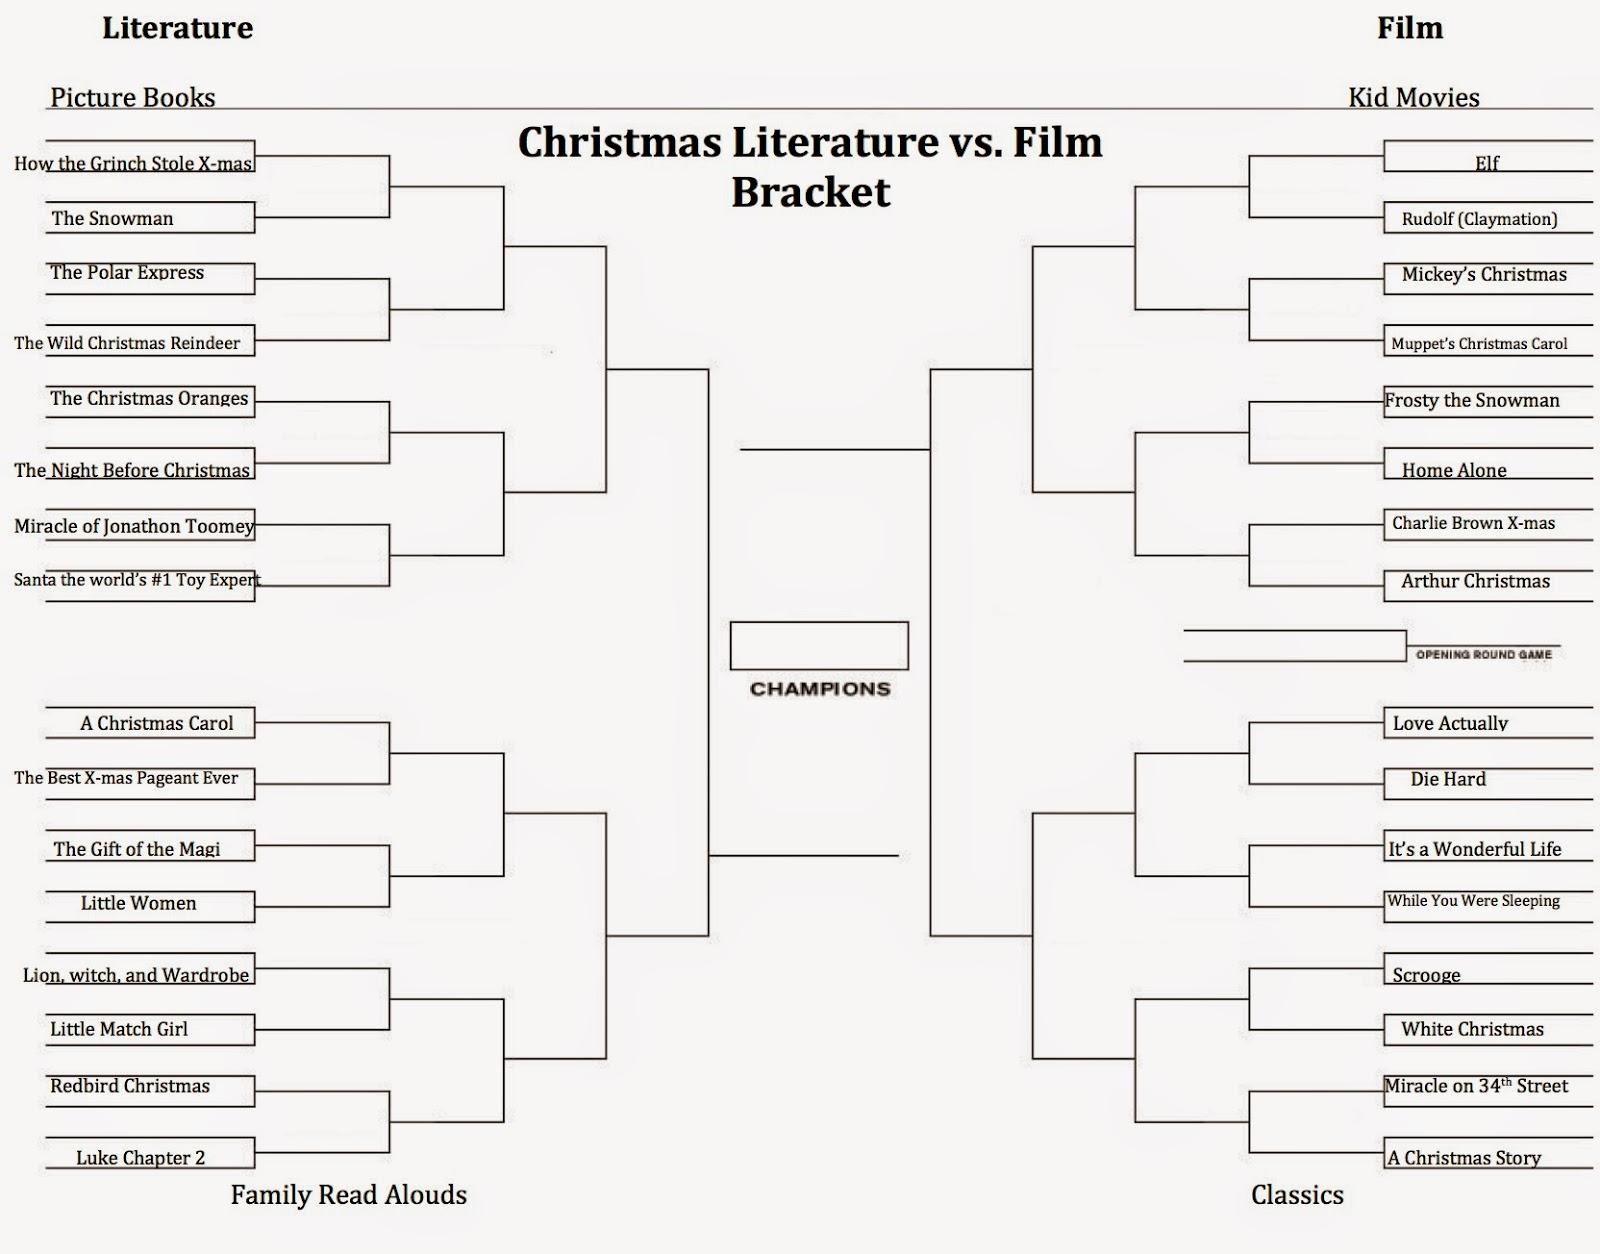 Heather Dent\'s Studio: Christmas Literature vs. Film